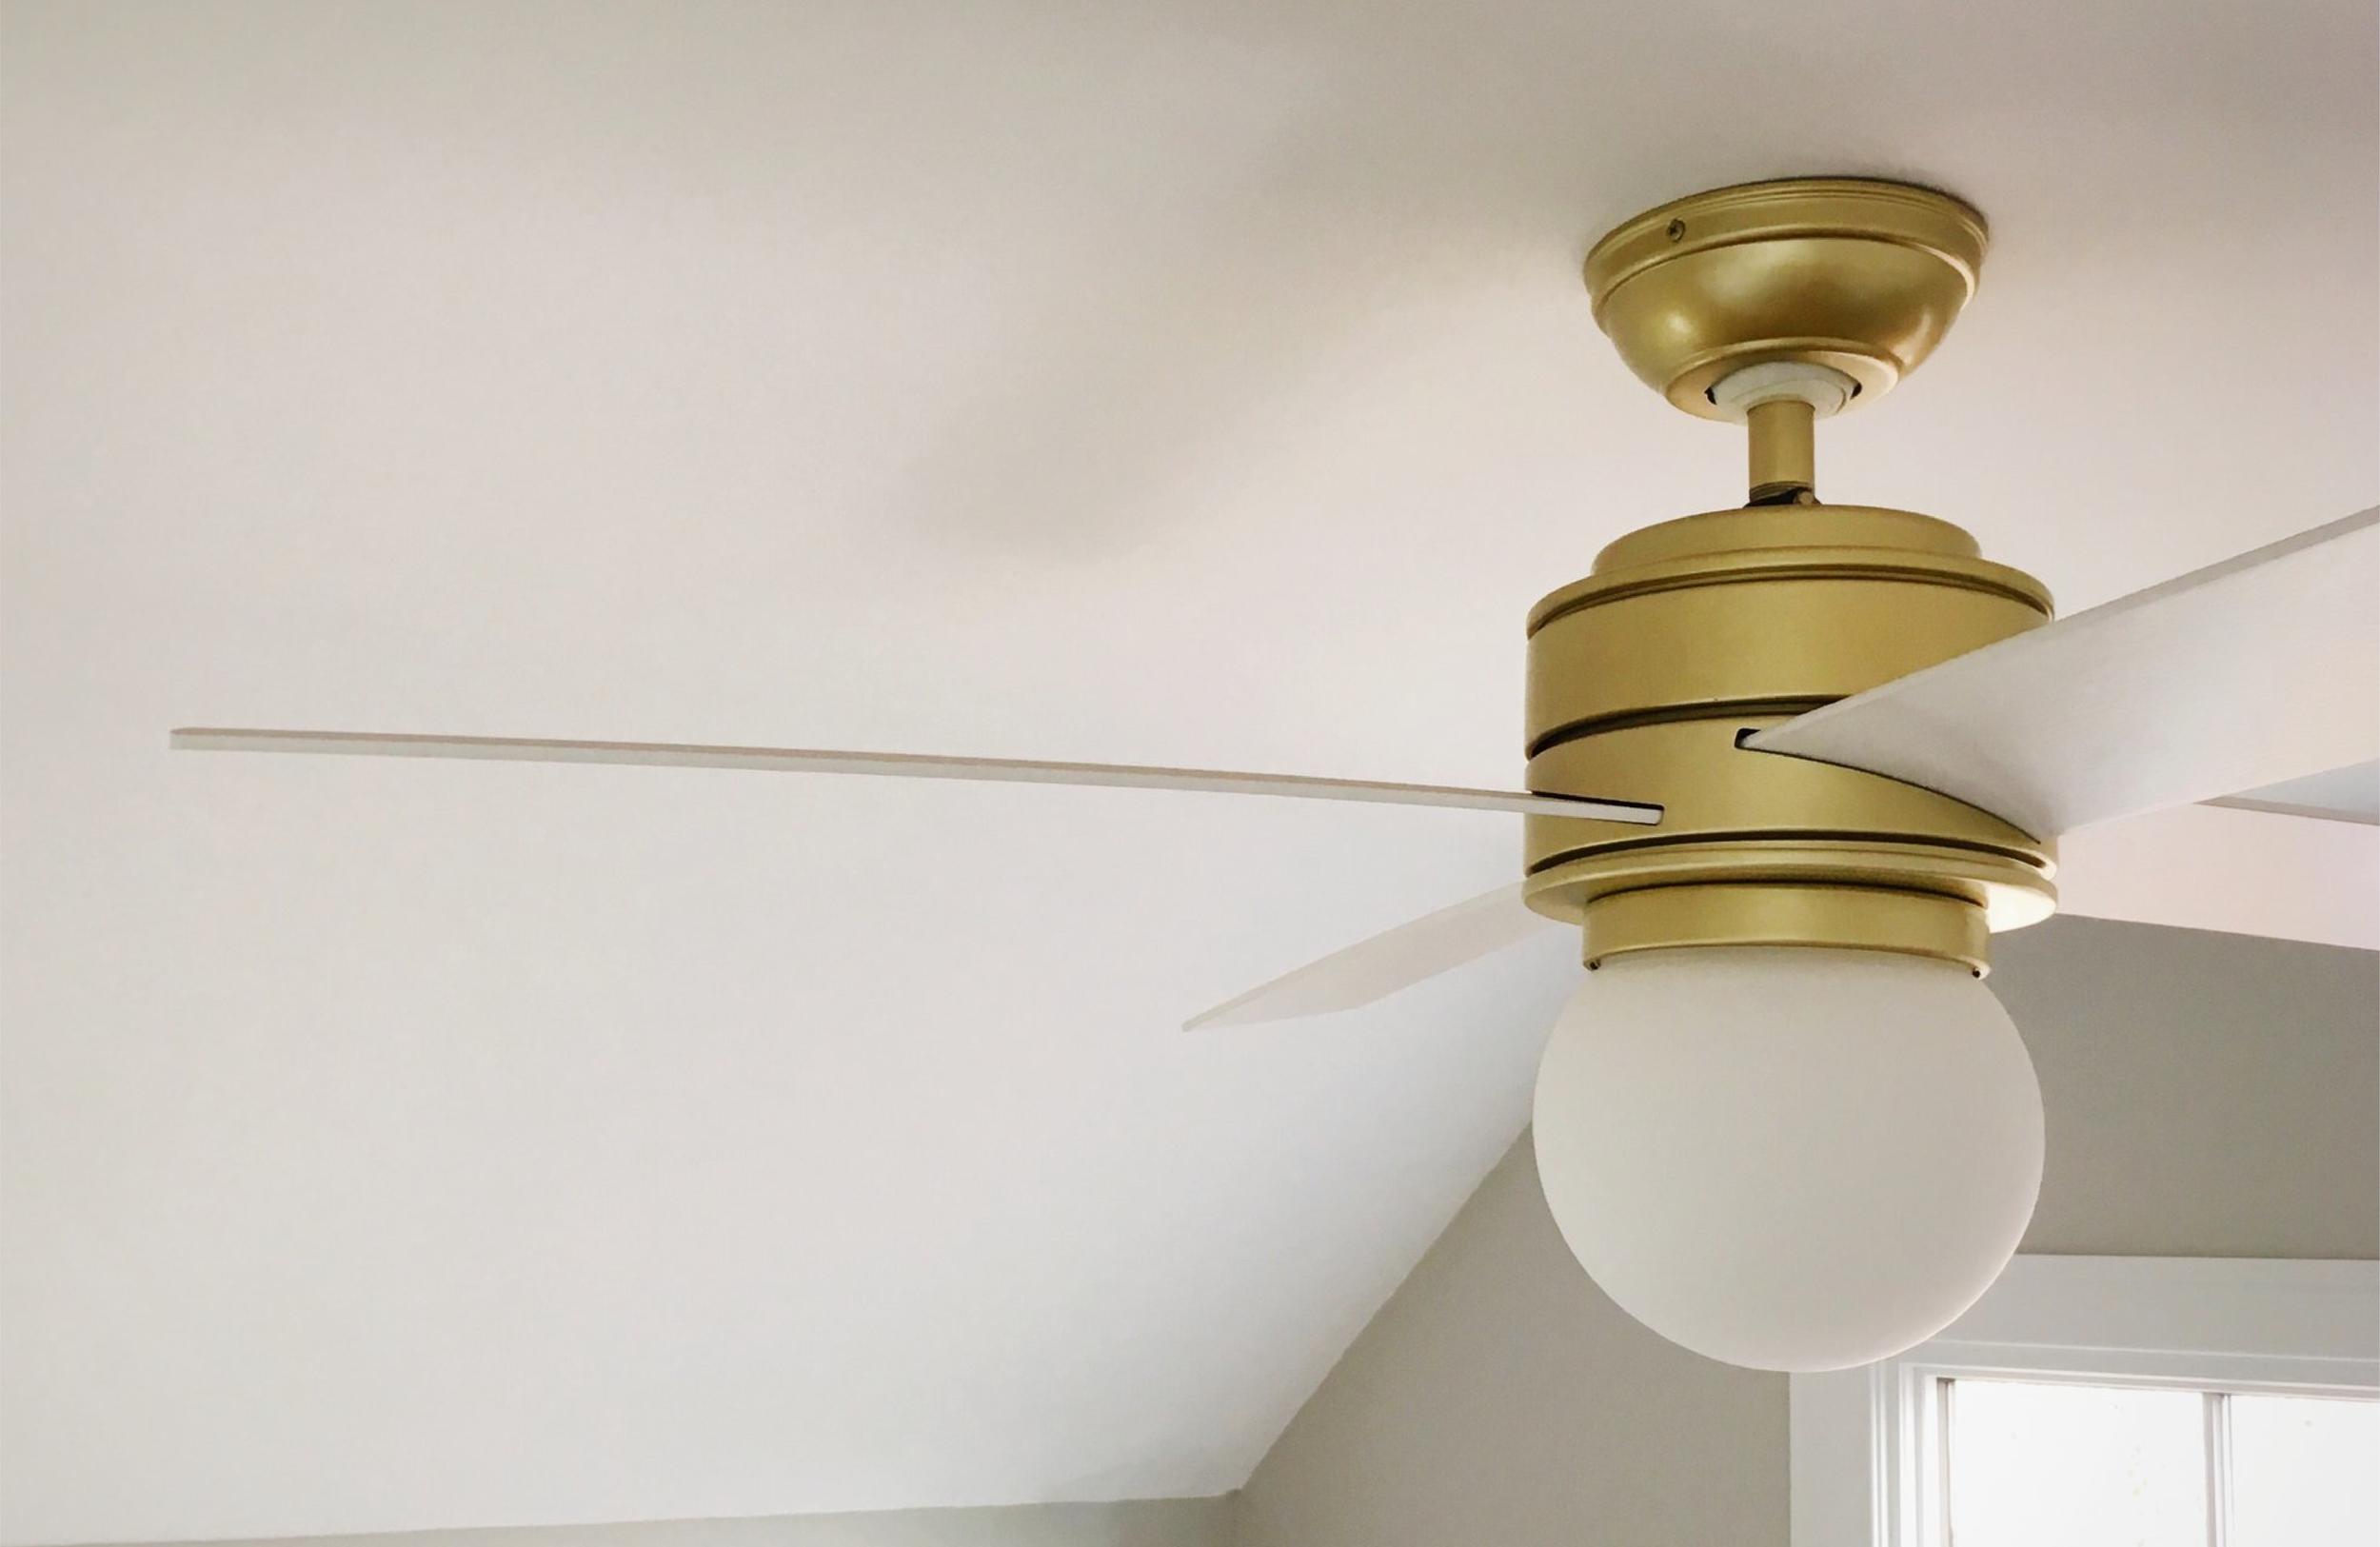 Stylish Ceiling Fans Howlett Co